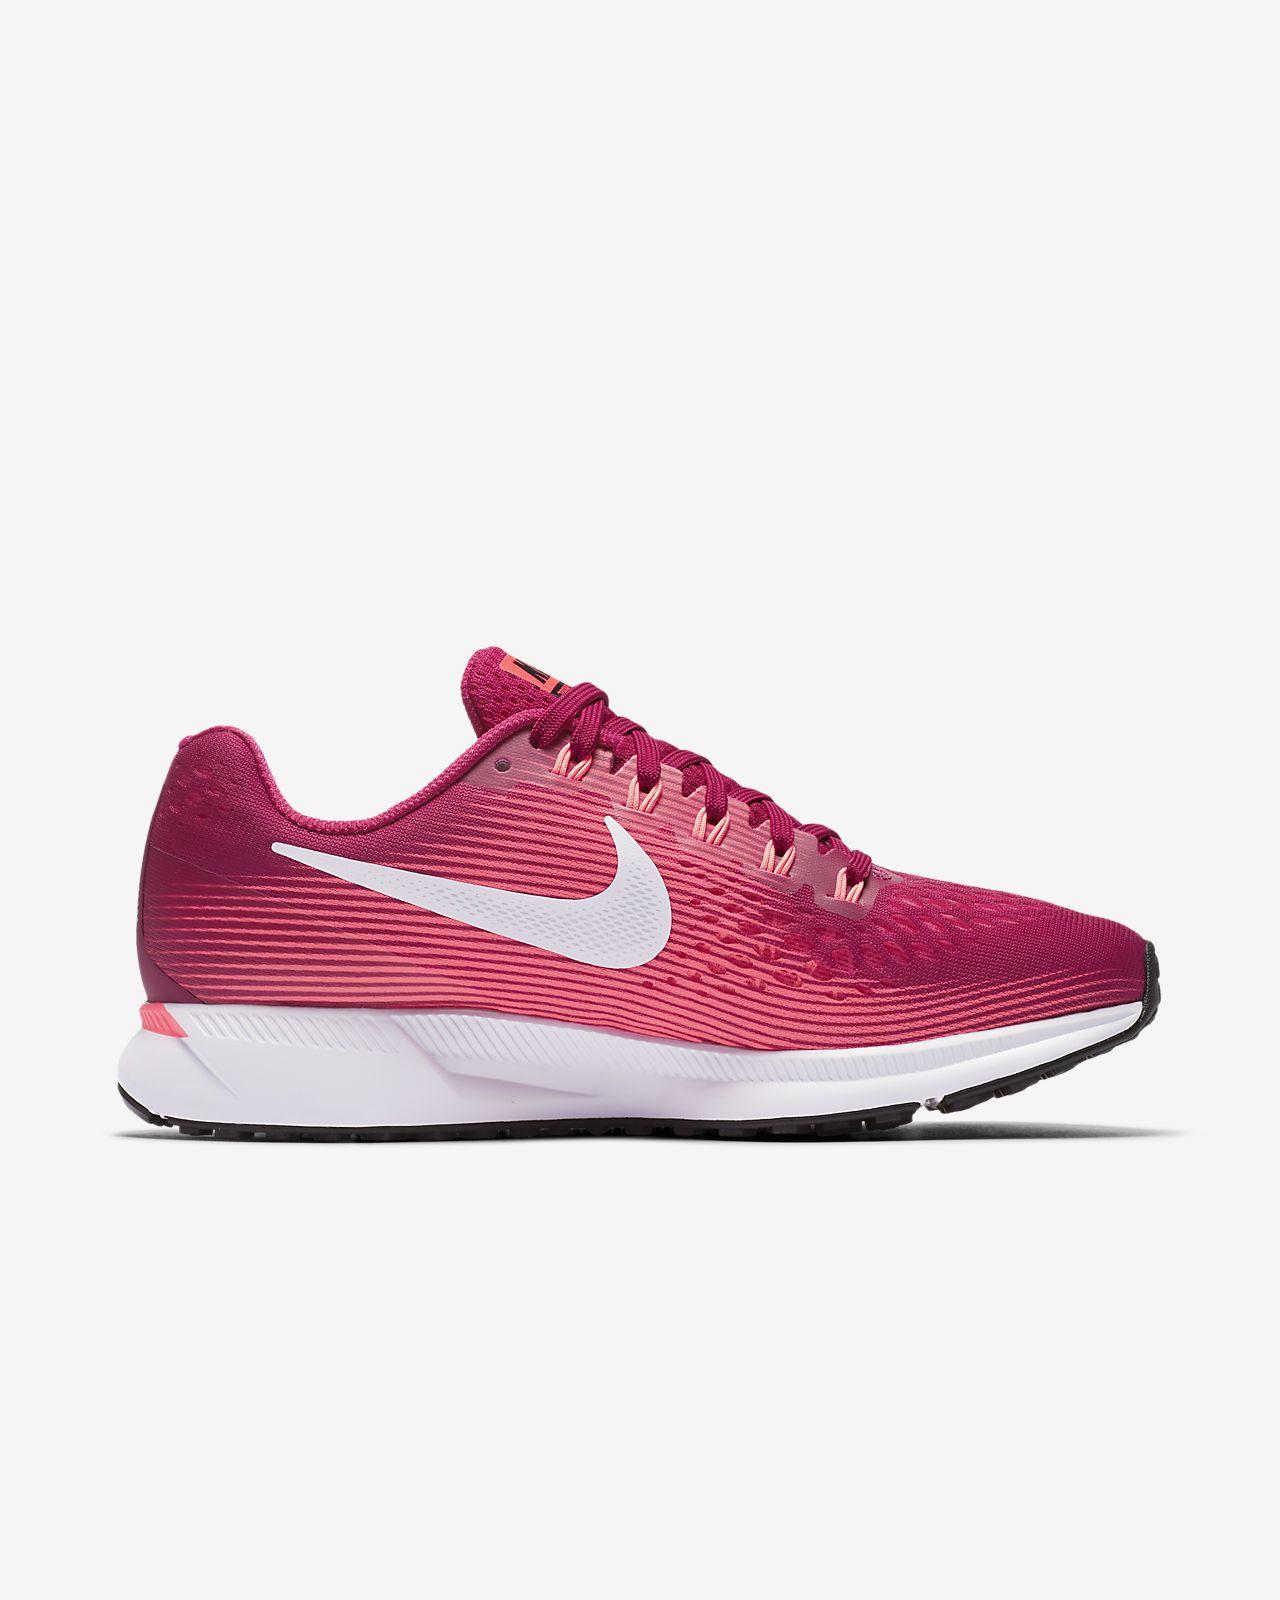 super popular 47968 9ff6c Nike - Air Zoom Pegasus 34 chaussures de running pour femmes (bleu clair) -